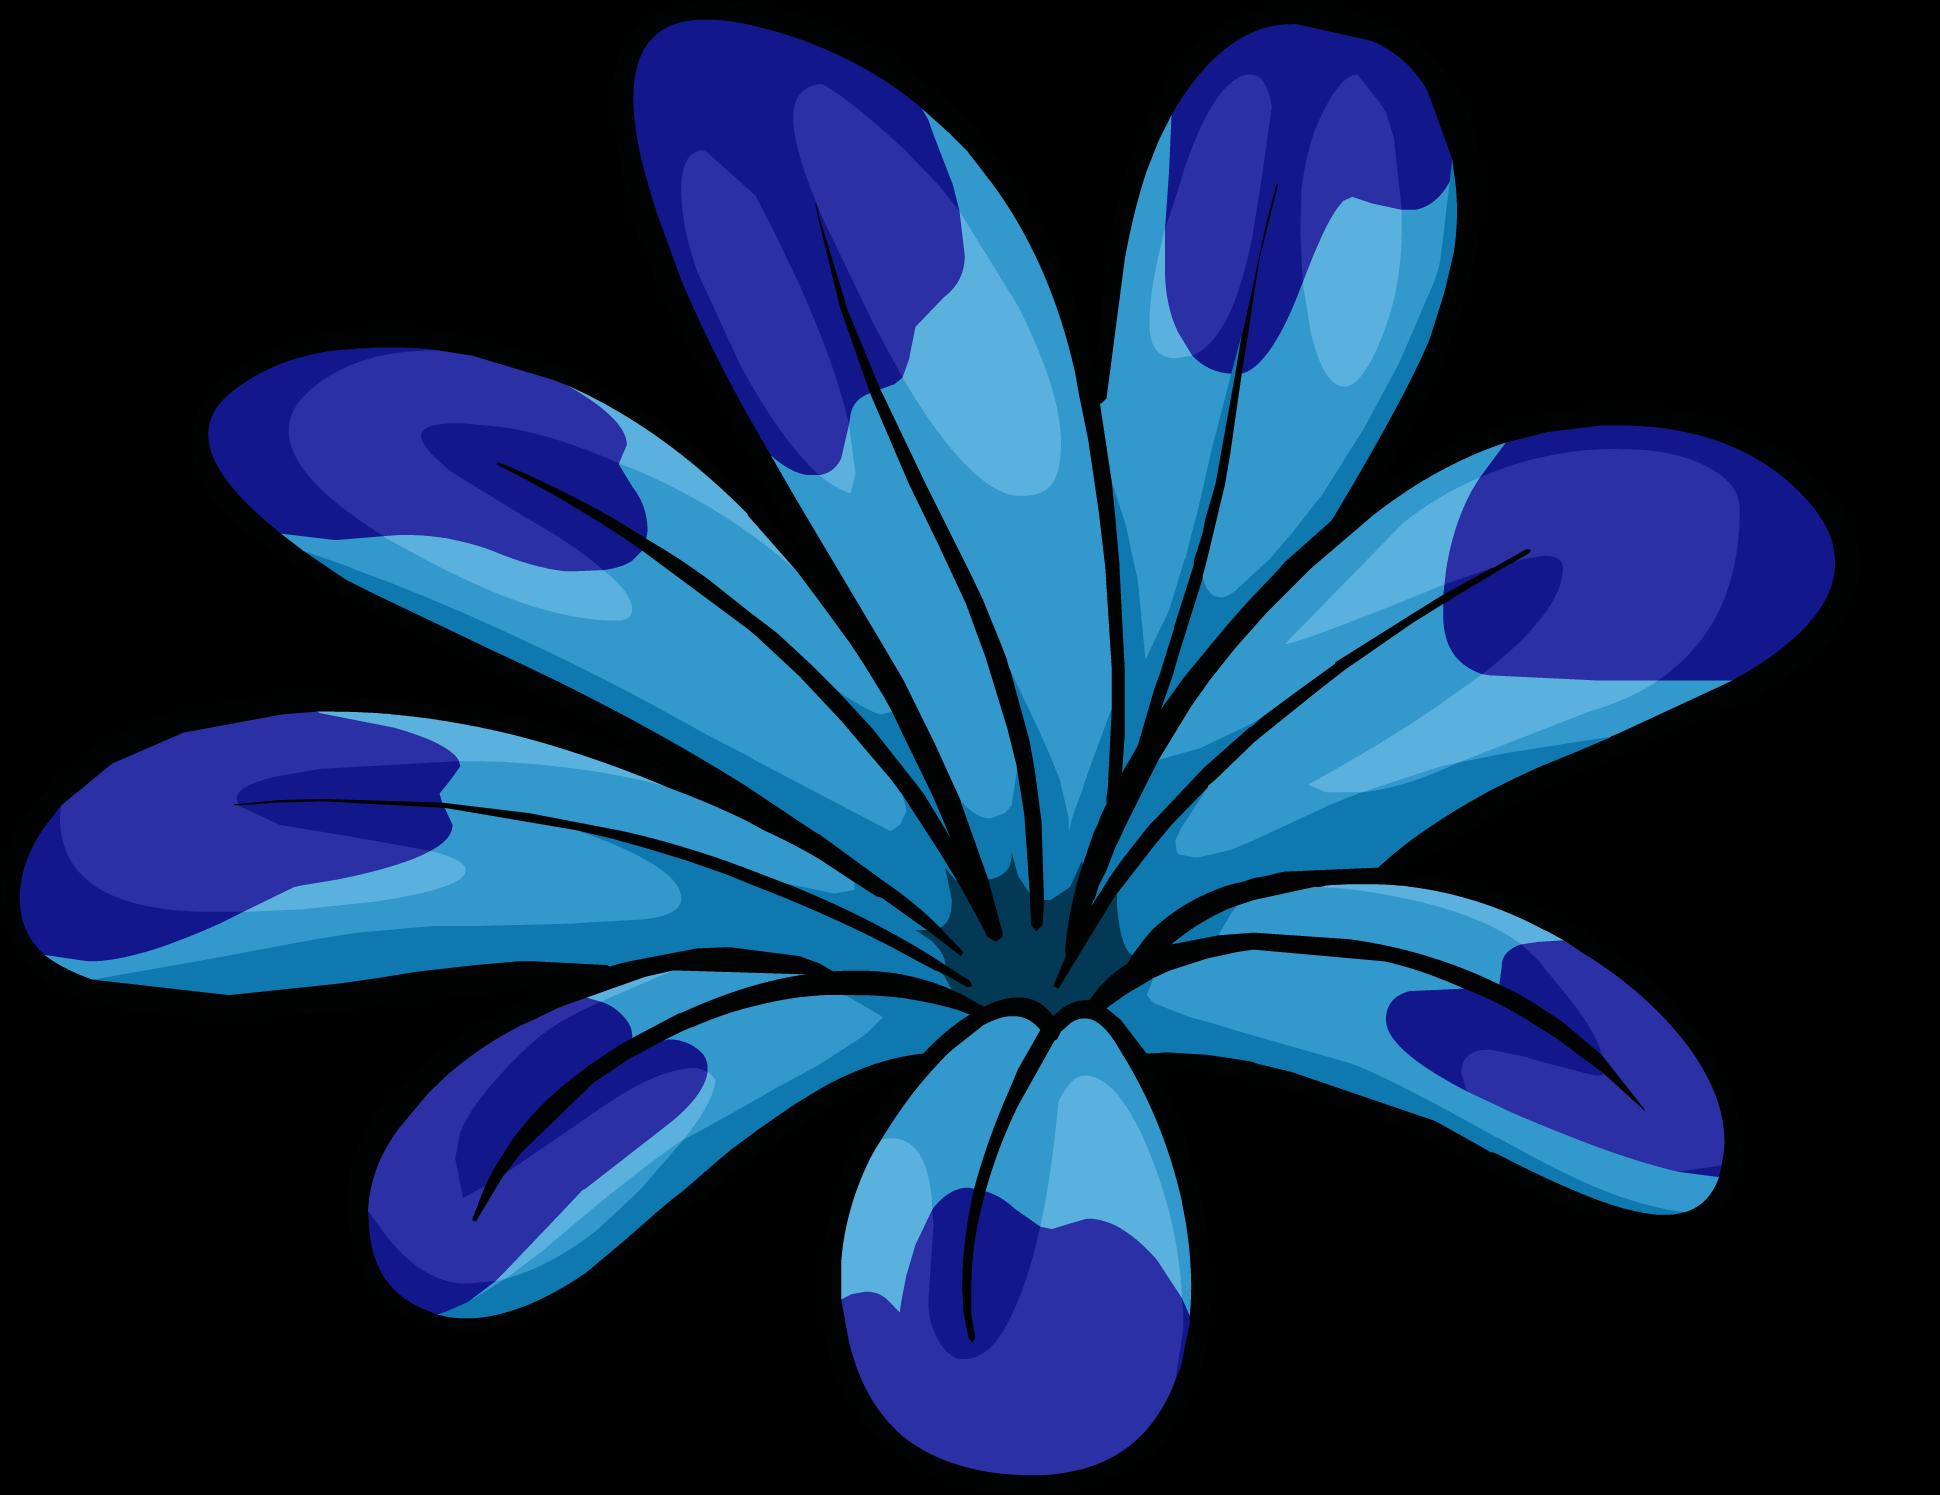 Jungle clipart flora. Image sprite png club